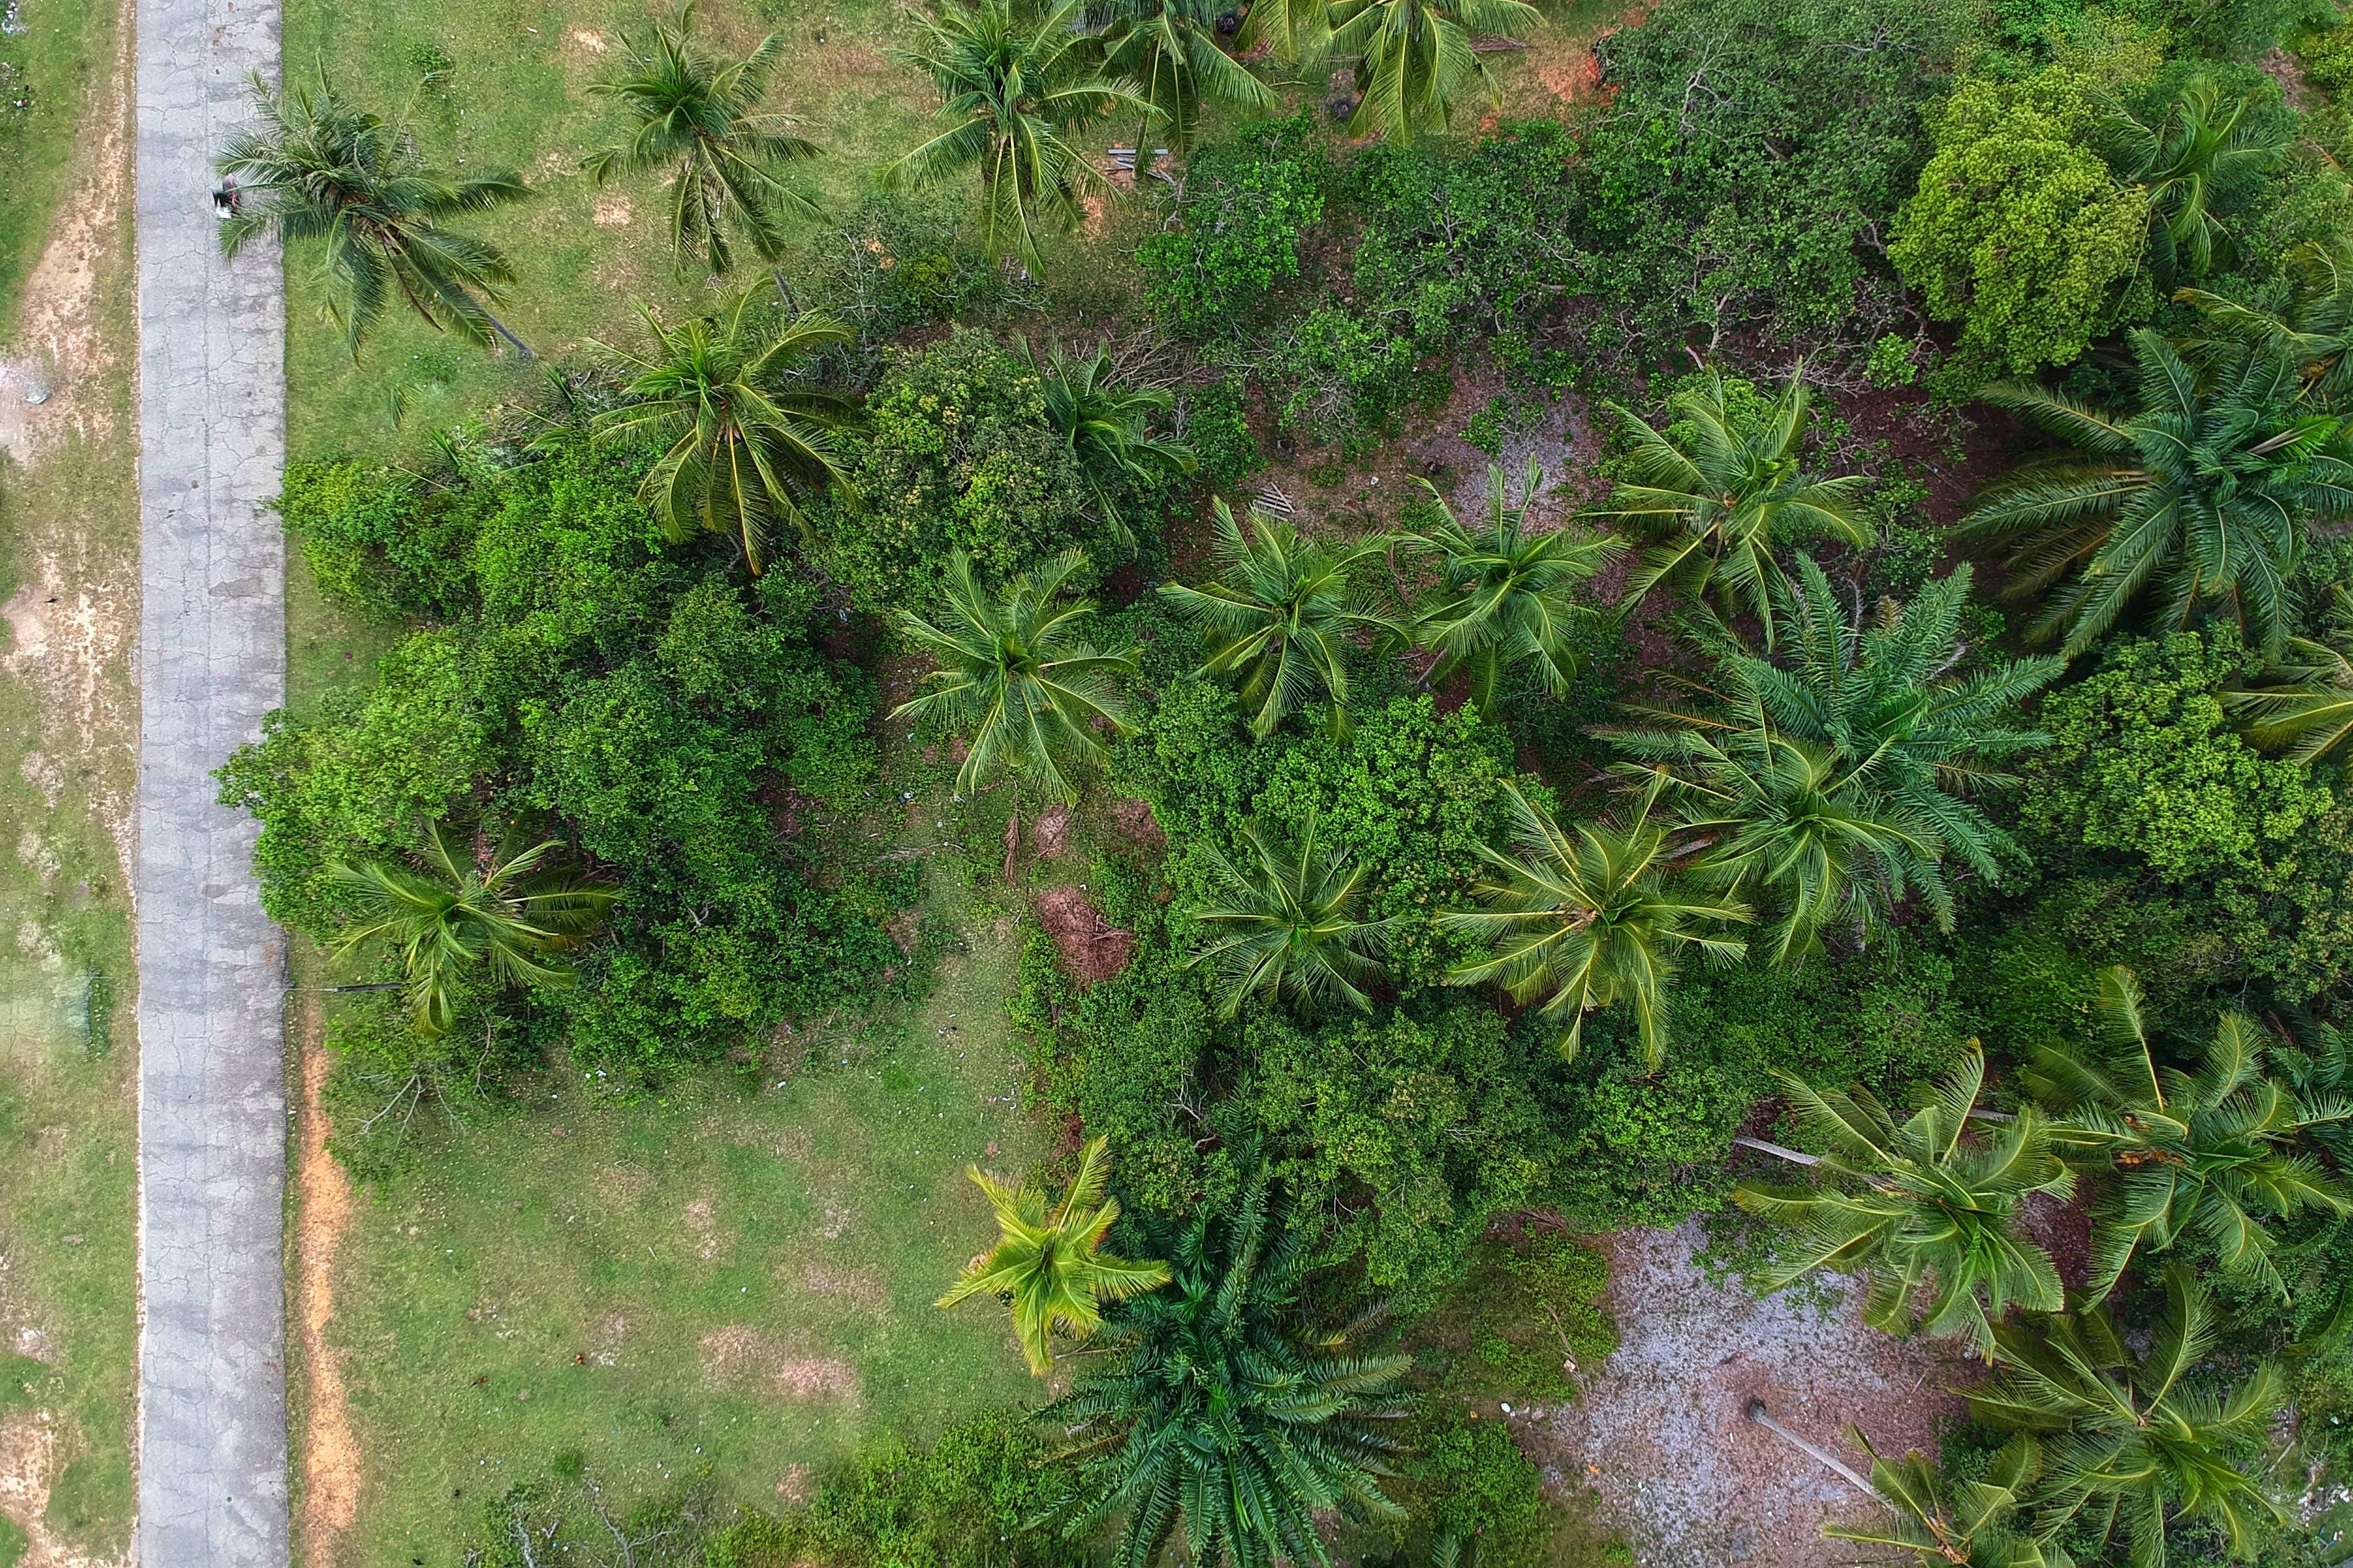 baum, botanisch, dunkelgrüne pflanzen